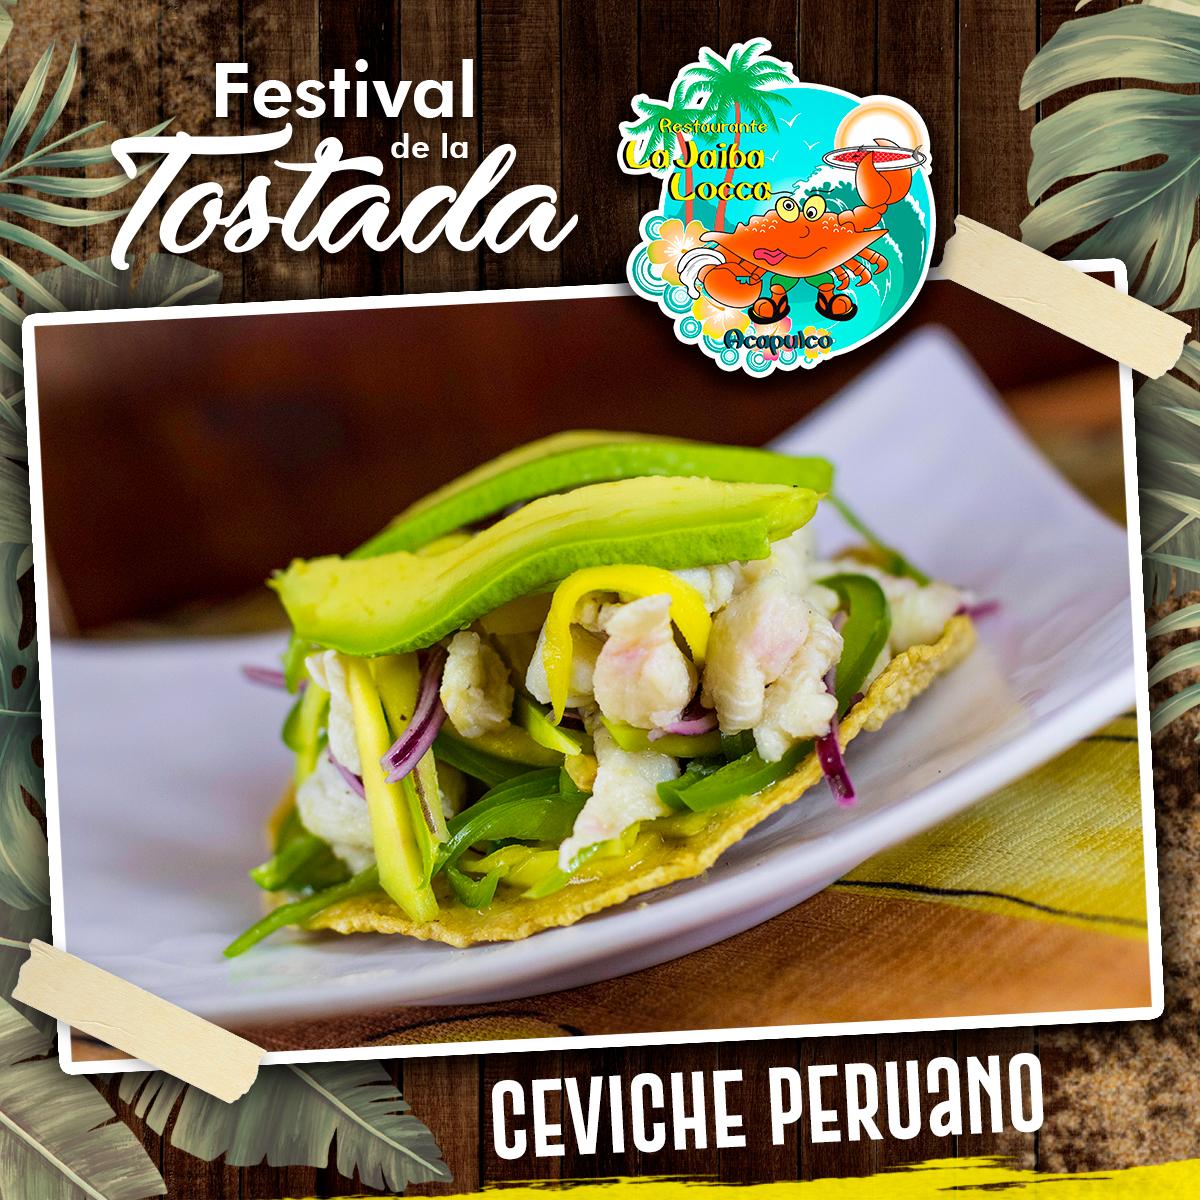 https://0201.nccdn.net/1_2/000/000/10e/3b3/ceviche-peruano..jpg